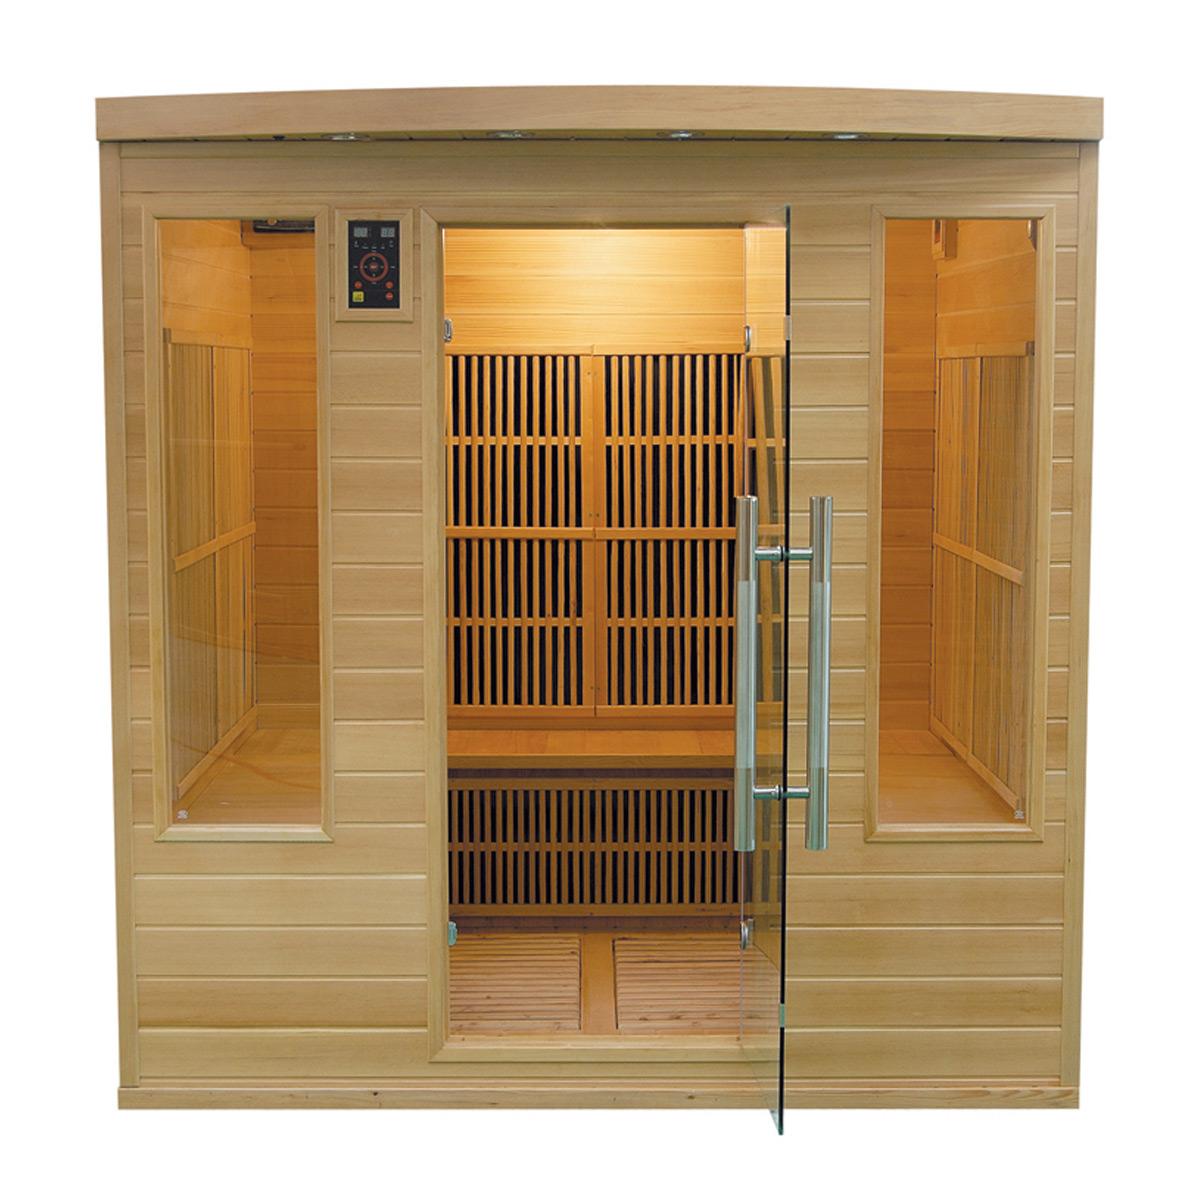 piscinex sauna apollon sauna infrarouge apollon club 4 5 places. Black Bedroom Furniture Sets. Home Design Ideas